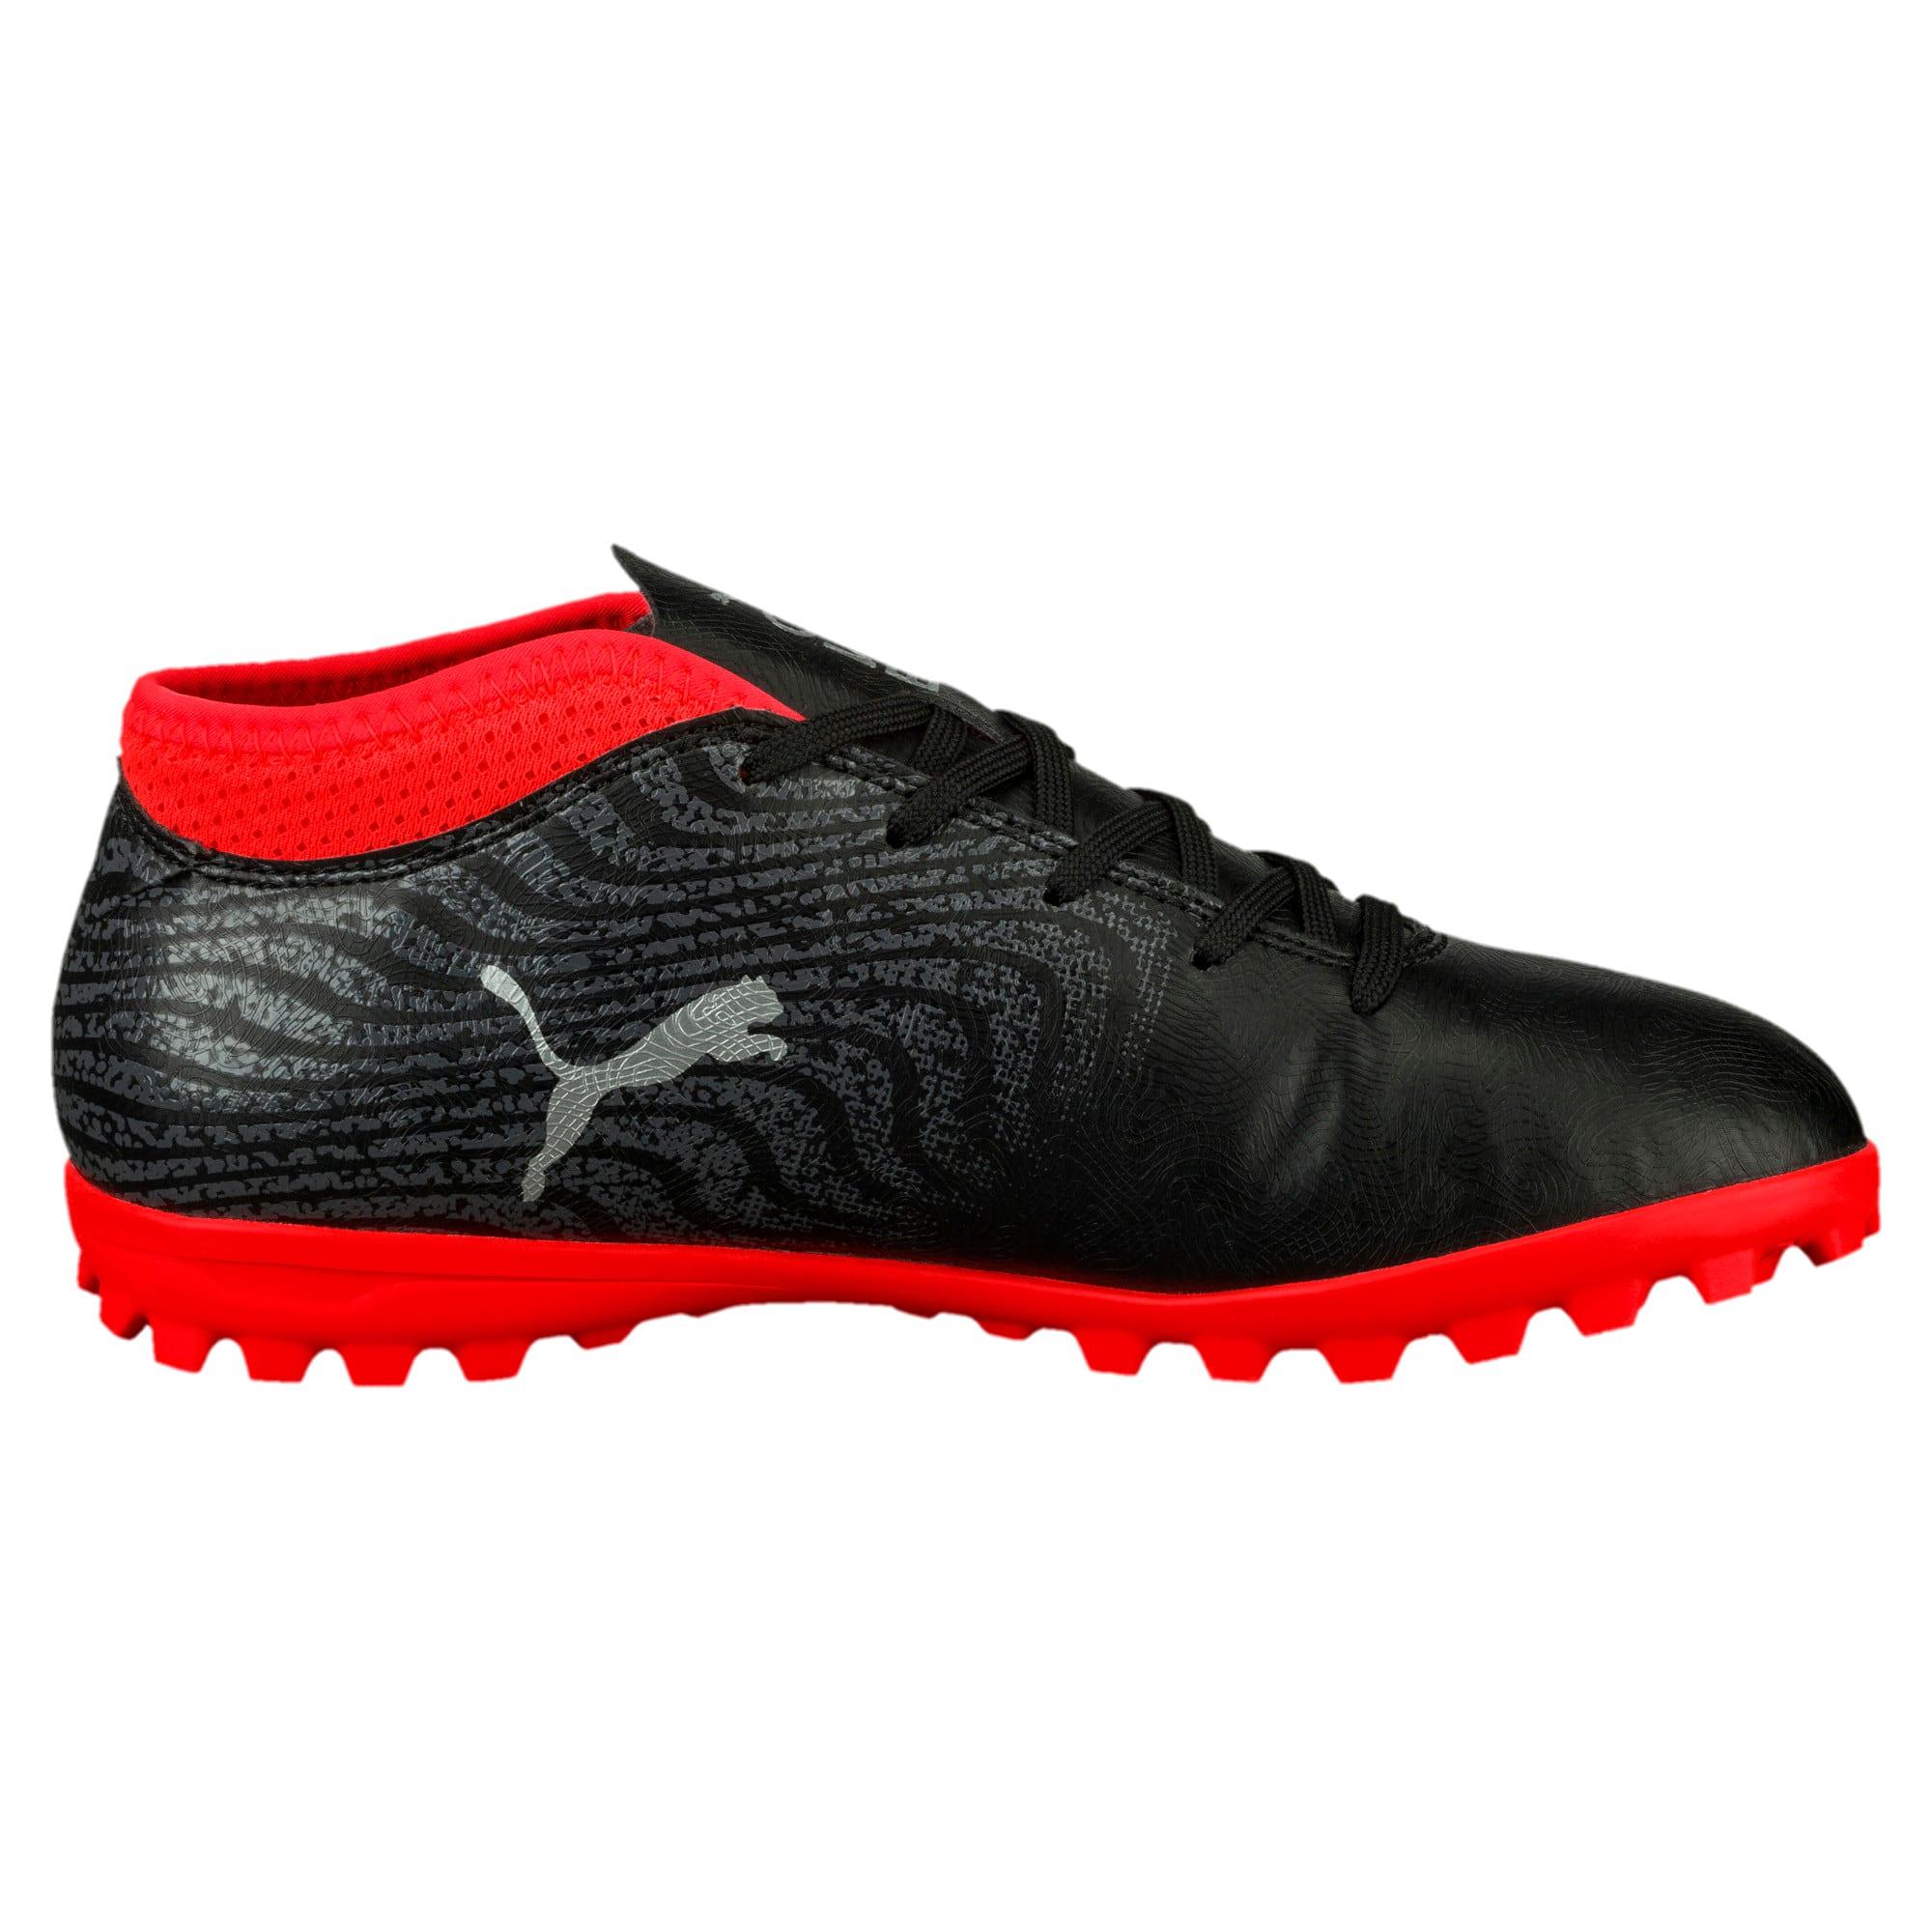 Thumbnail 3 of ONE 18.4 TT Jr Football Boots, Black-Silver-Red, medium-IND